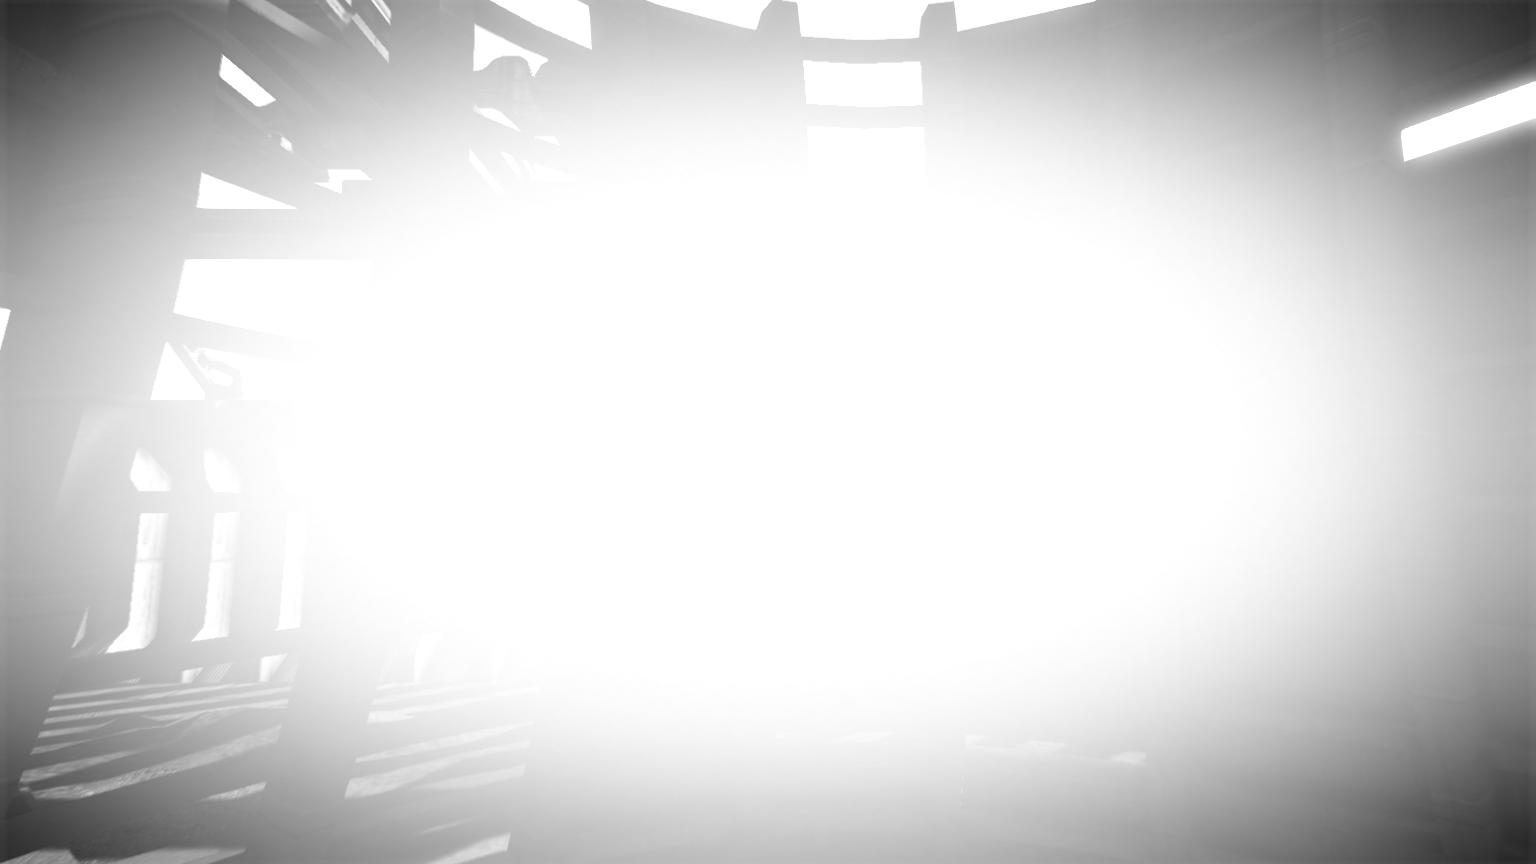 Реверс-инжиниринг рендеринга «Ведьмака 3» - 19